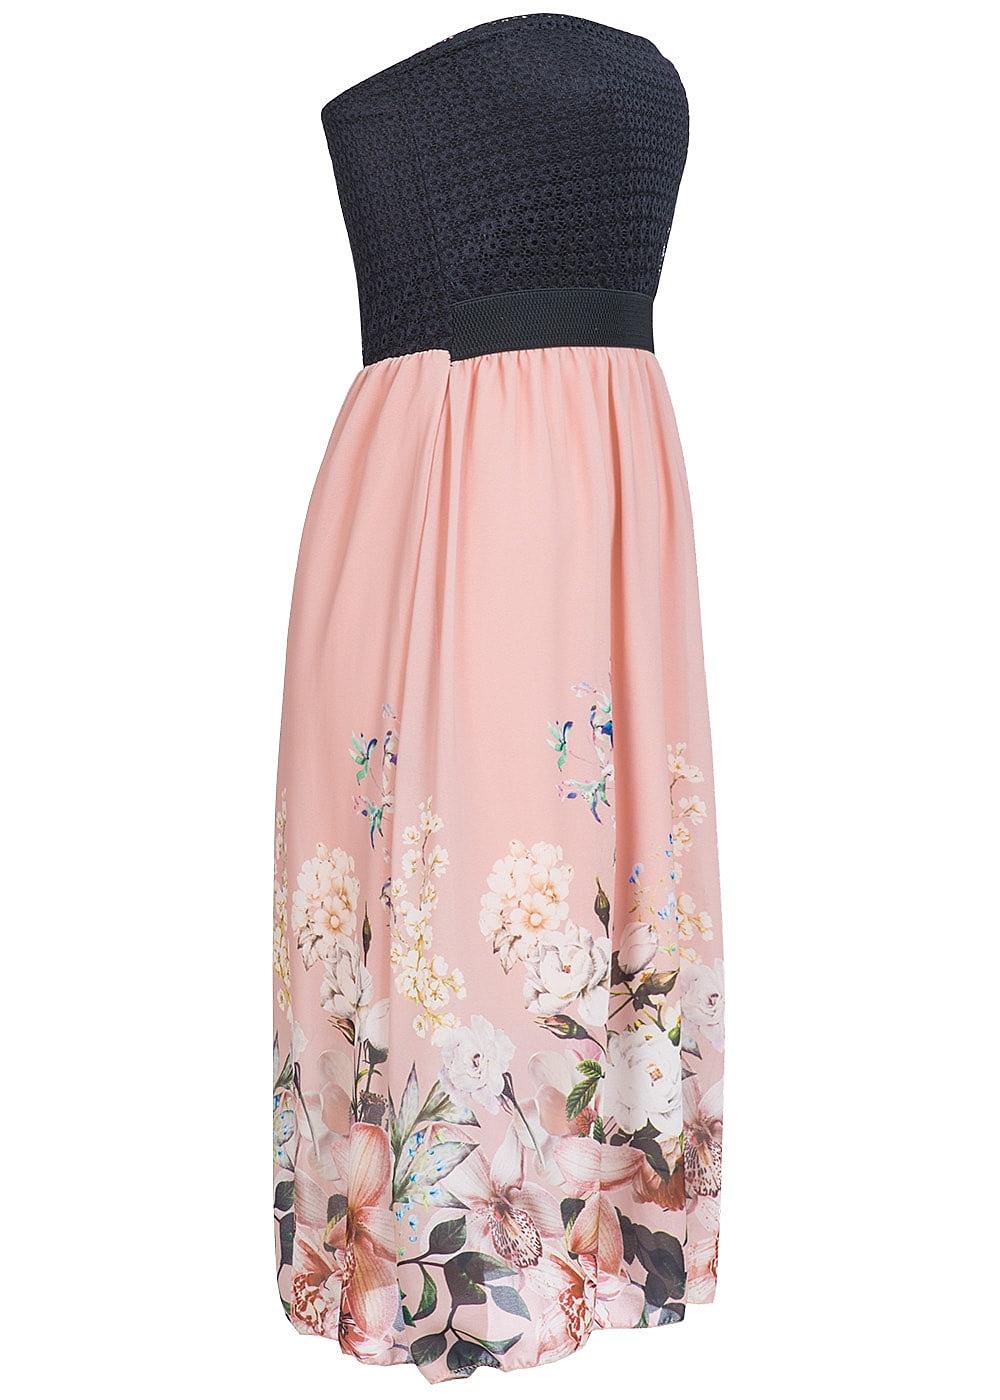 styleboom fashion damen midi bandeau kleid blumen muster brustpads spitze schwarz rosa. Black Bedroom Furniture Sets. Home Design Ideas